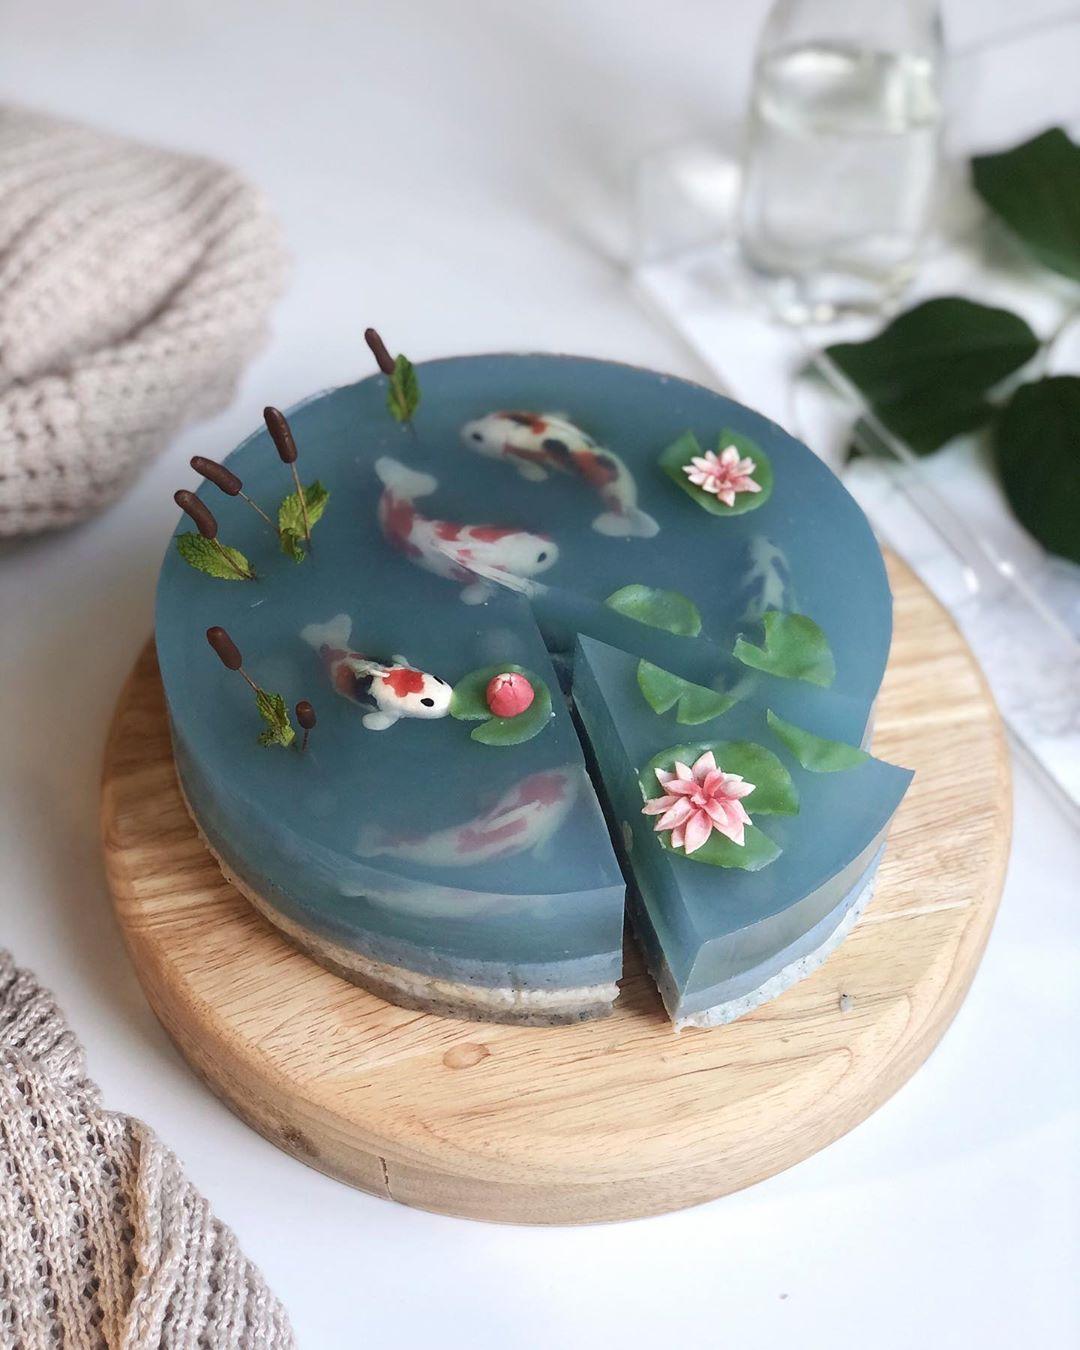 transparentne ciasto jeziorko